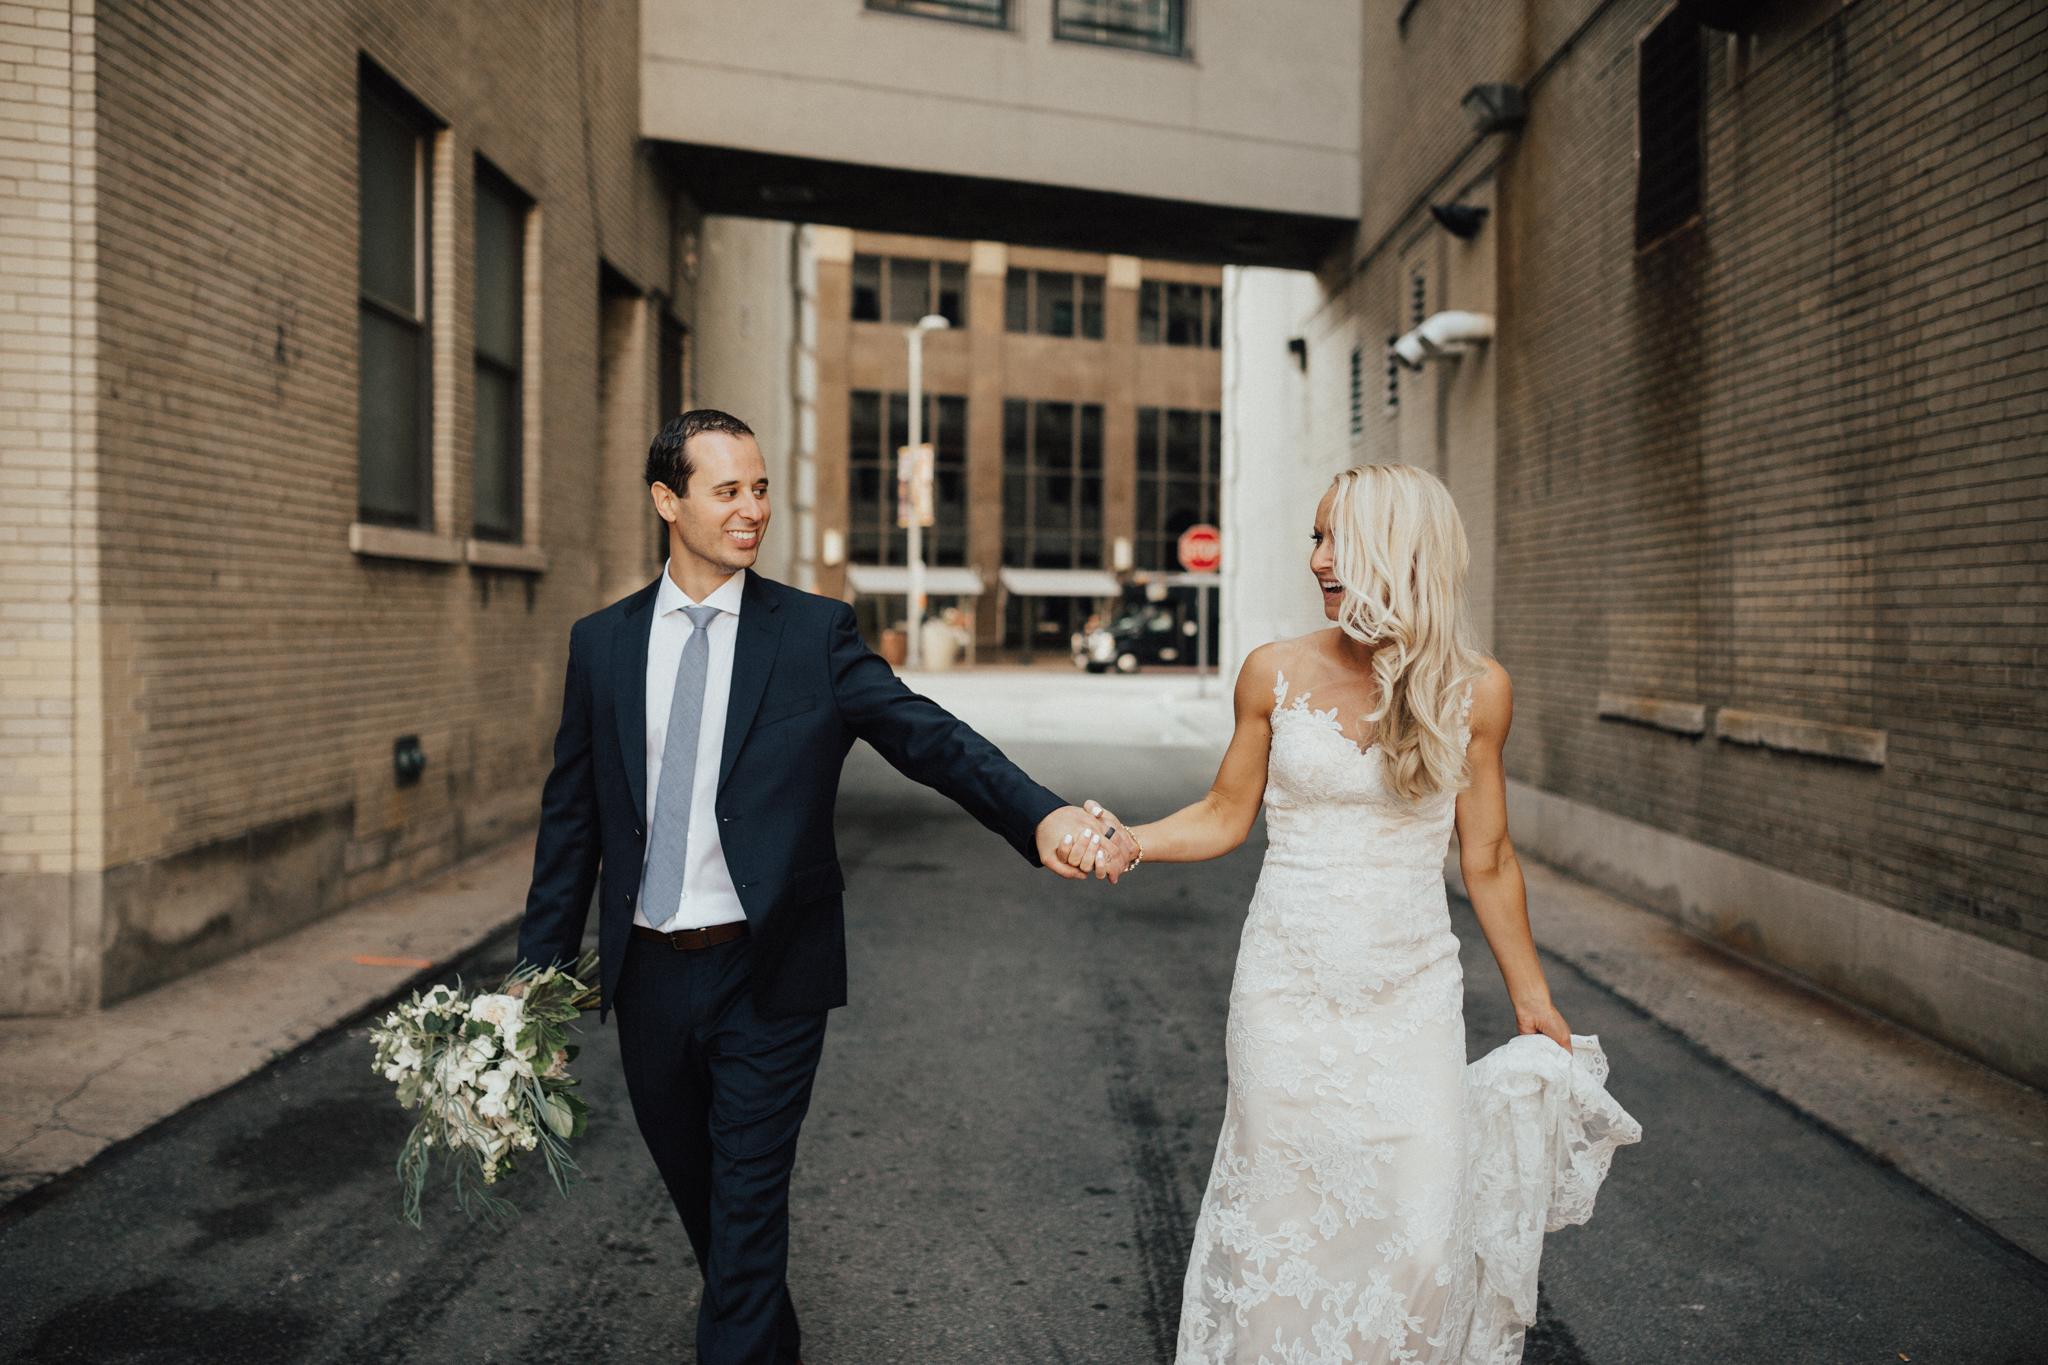 Arizona-Adventure-Elopement-Wedding-Photographer-60.jpg